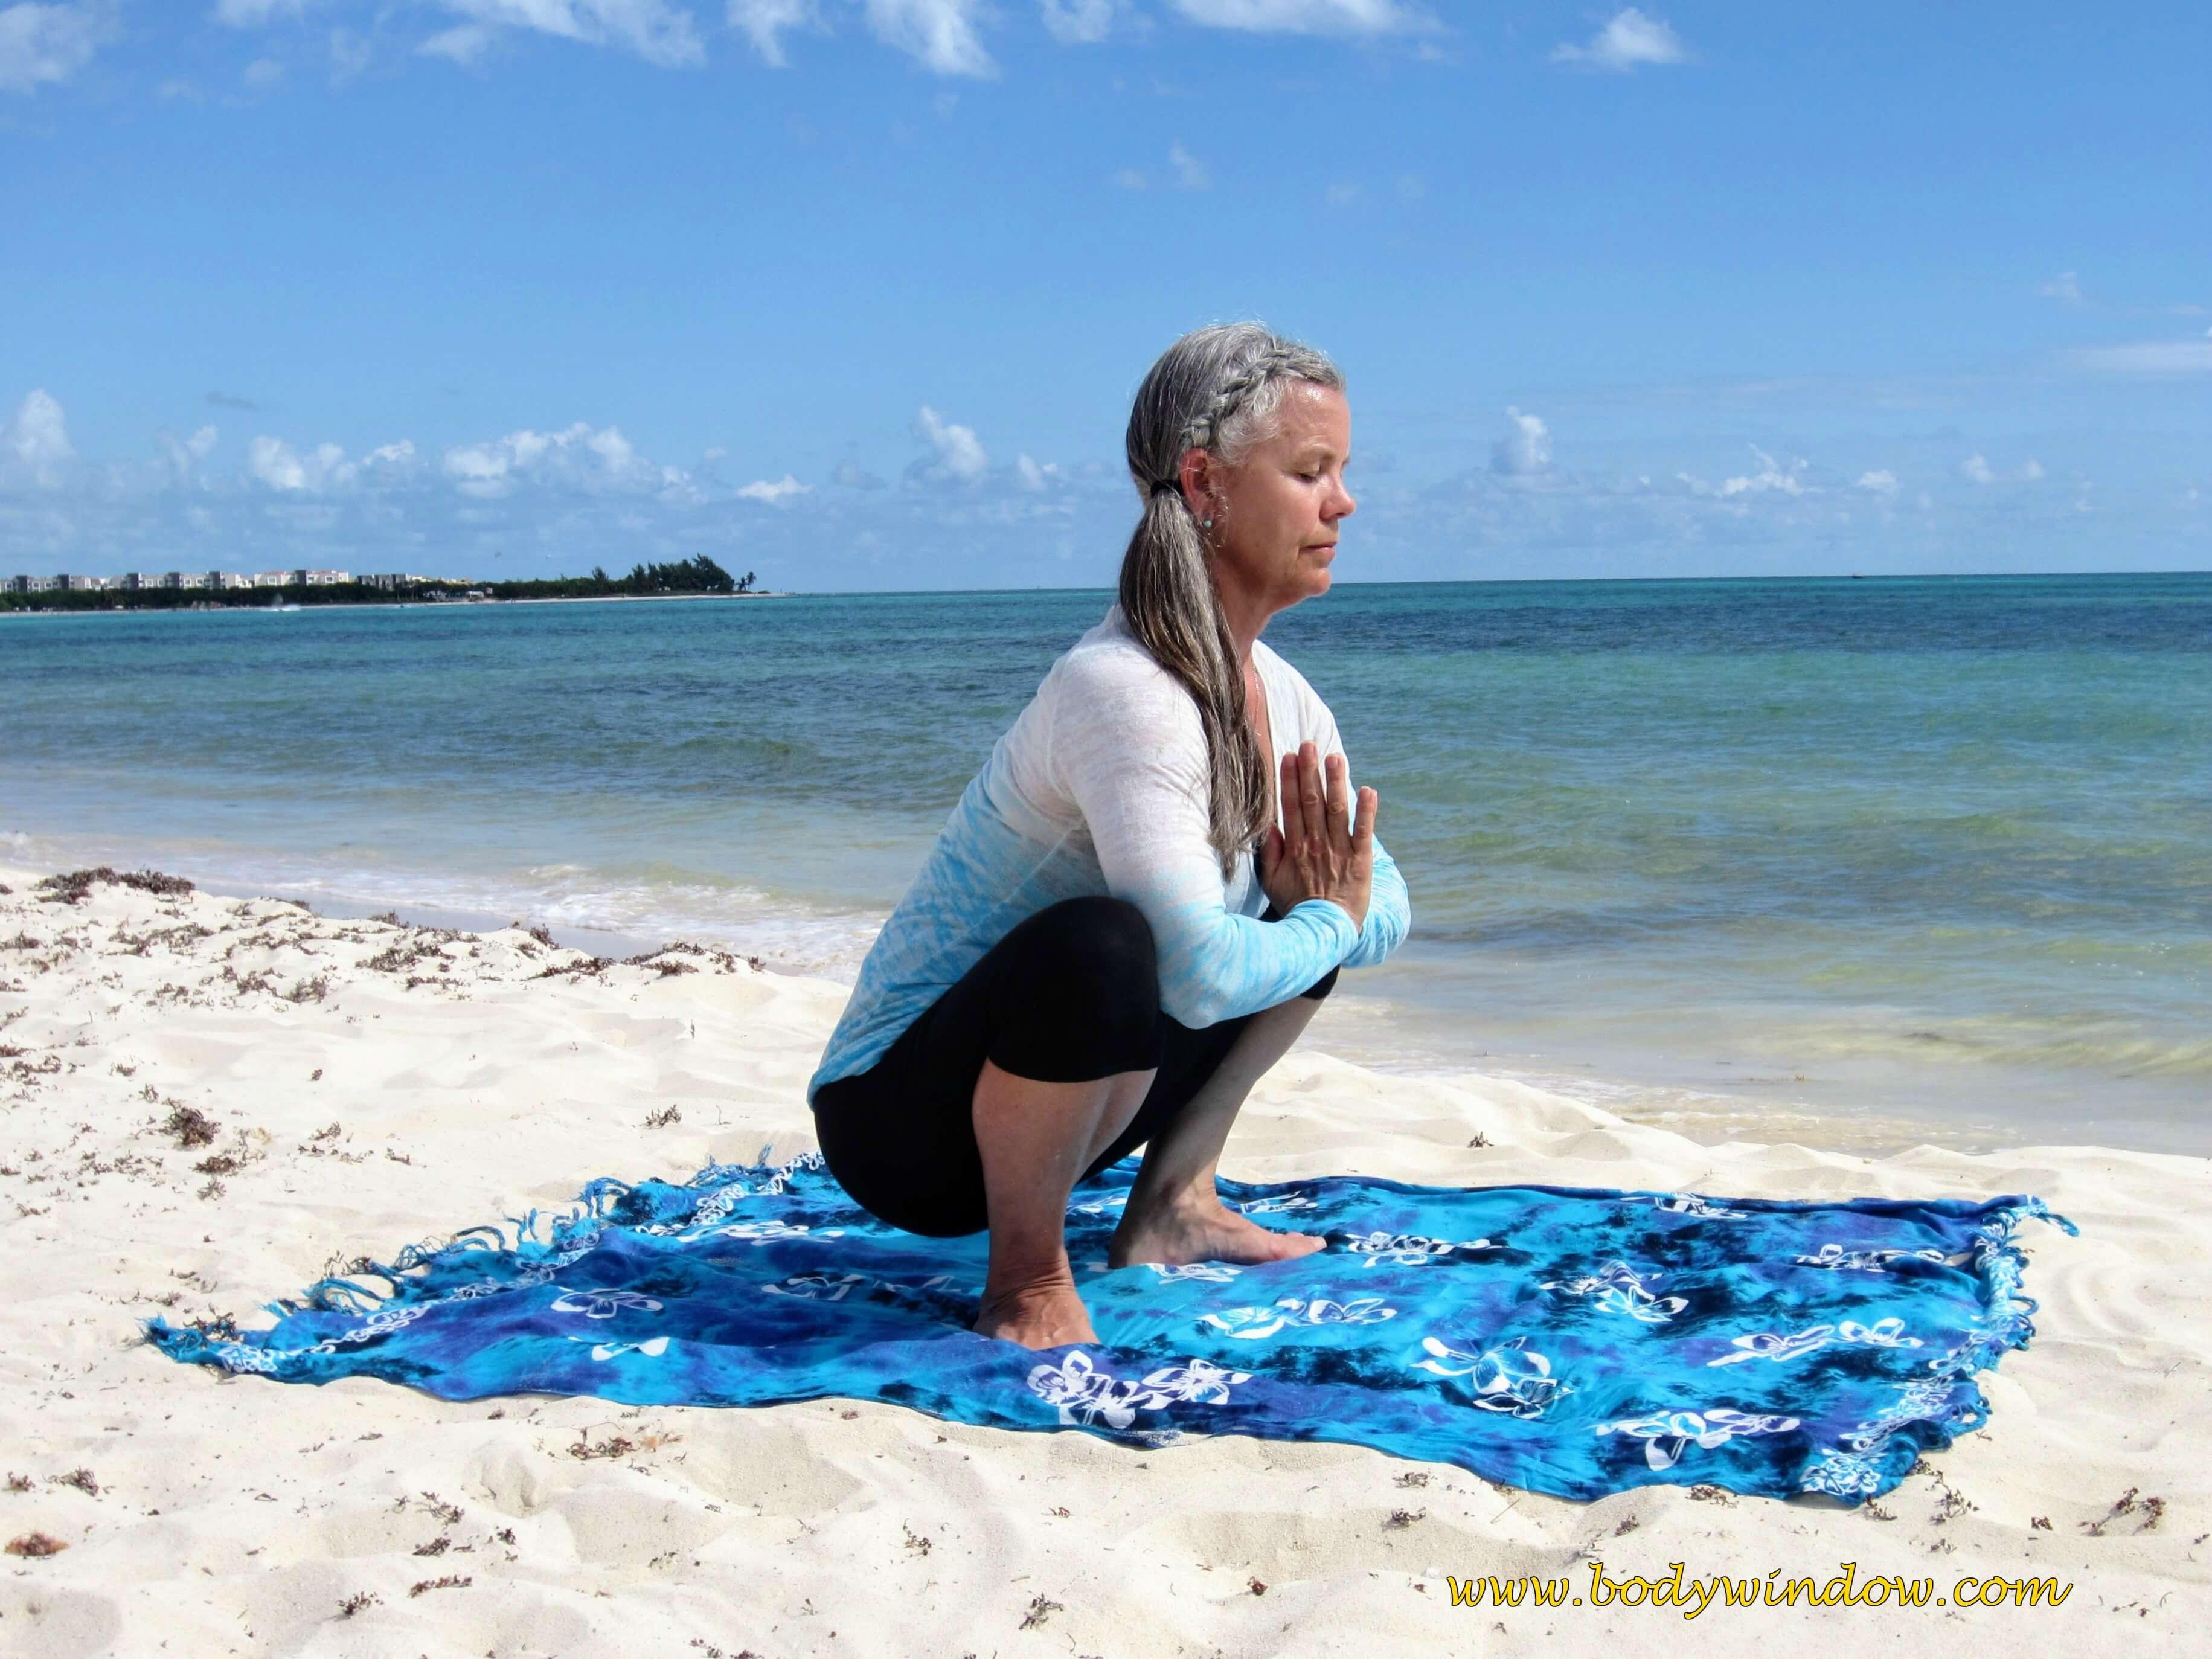 Squat Pose on a beach in Playa del Carmen, Mexico.